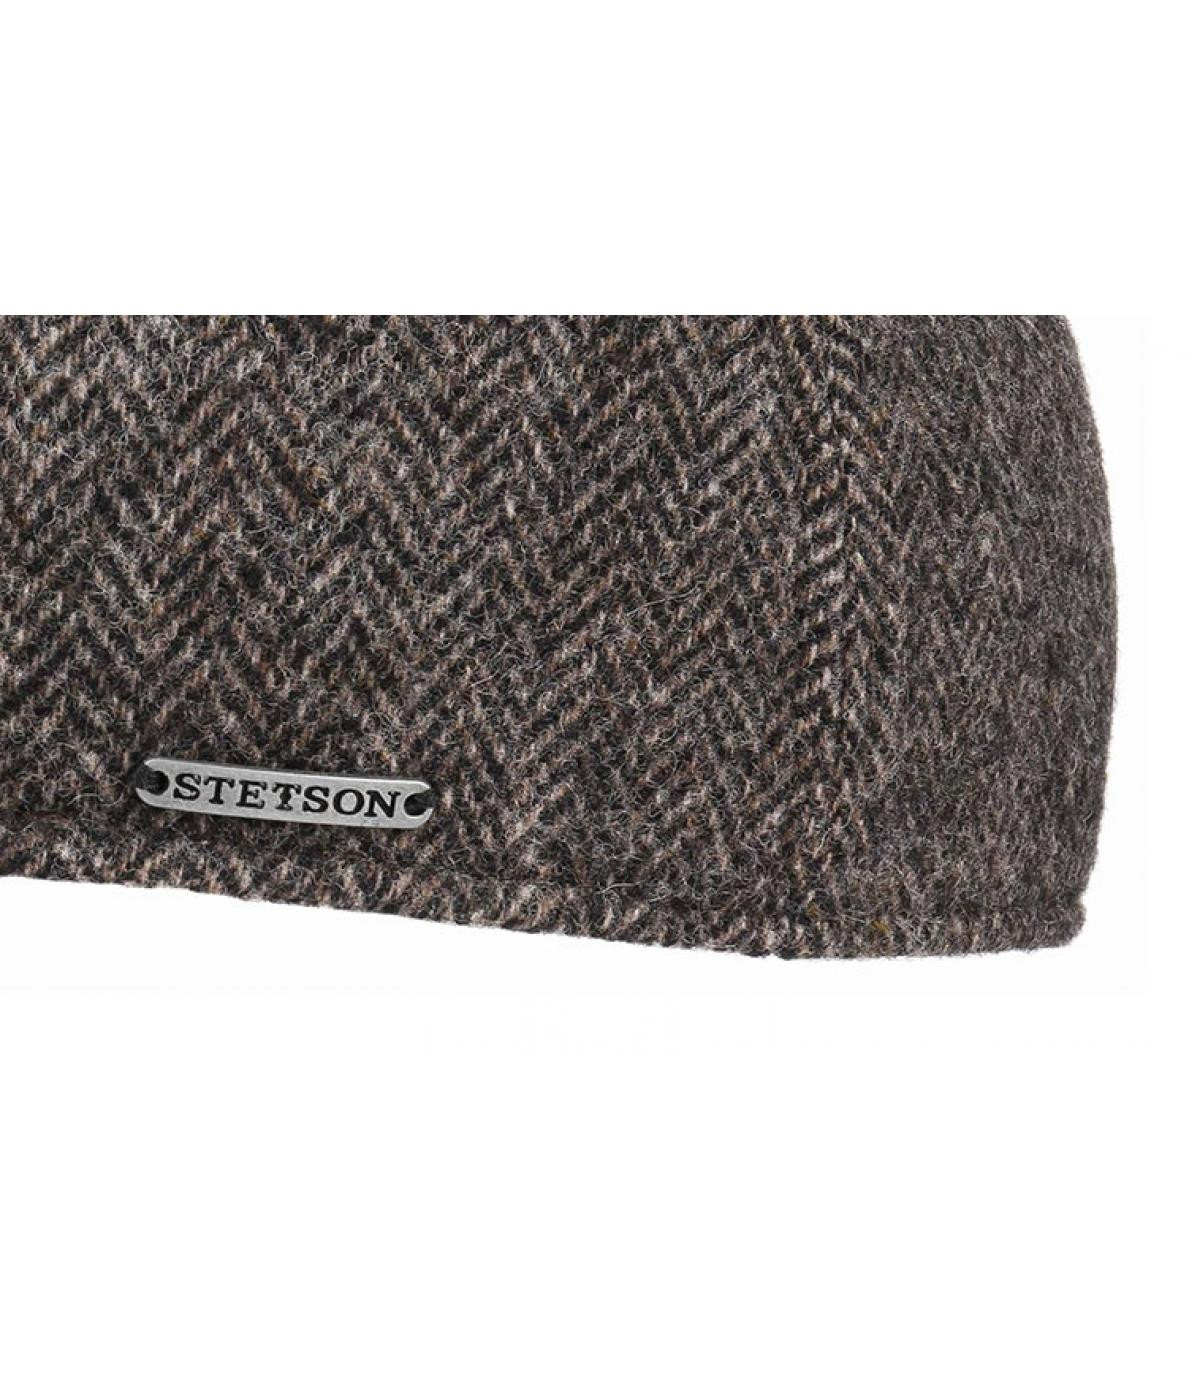 Details Texas Woolrich Herringbone grey - Abbildung 3